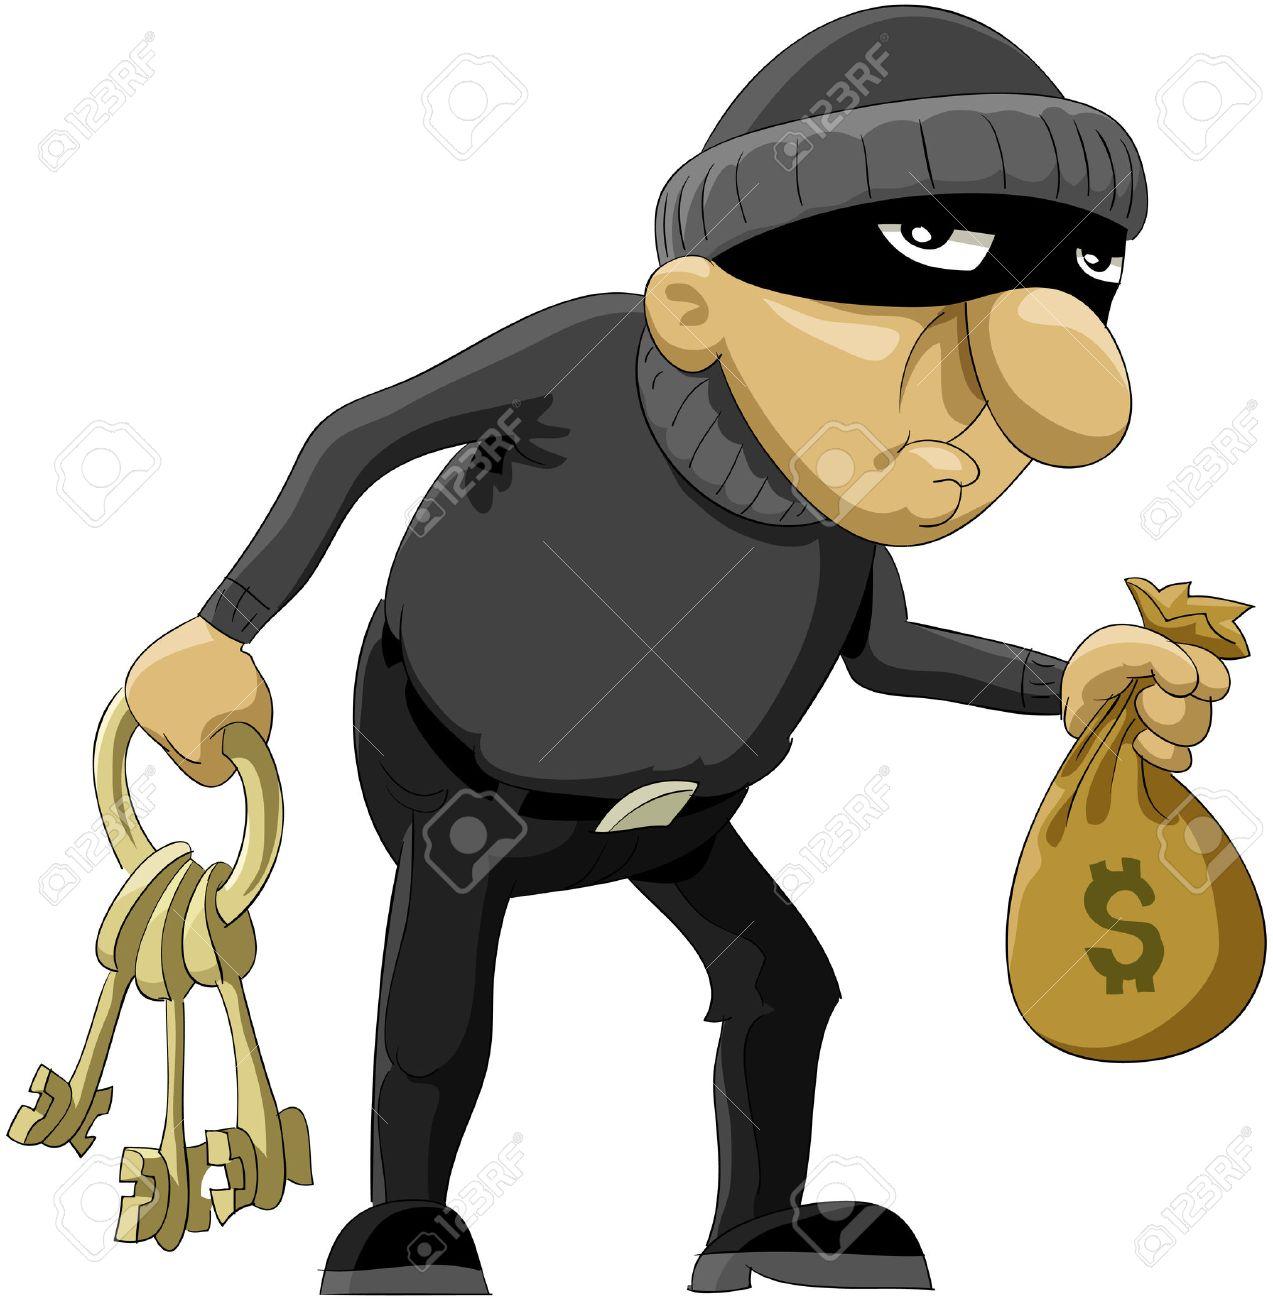 Cartoon Thief Running Thief Cartoon The Robber in